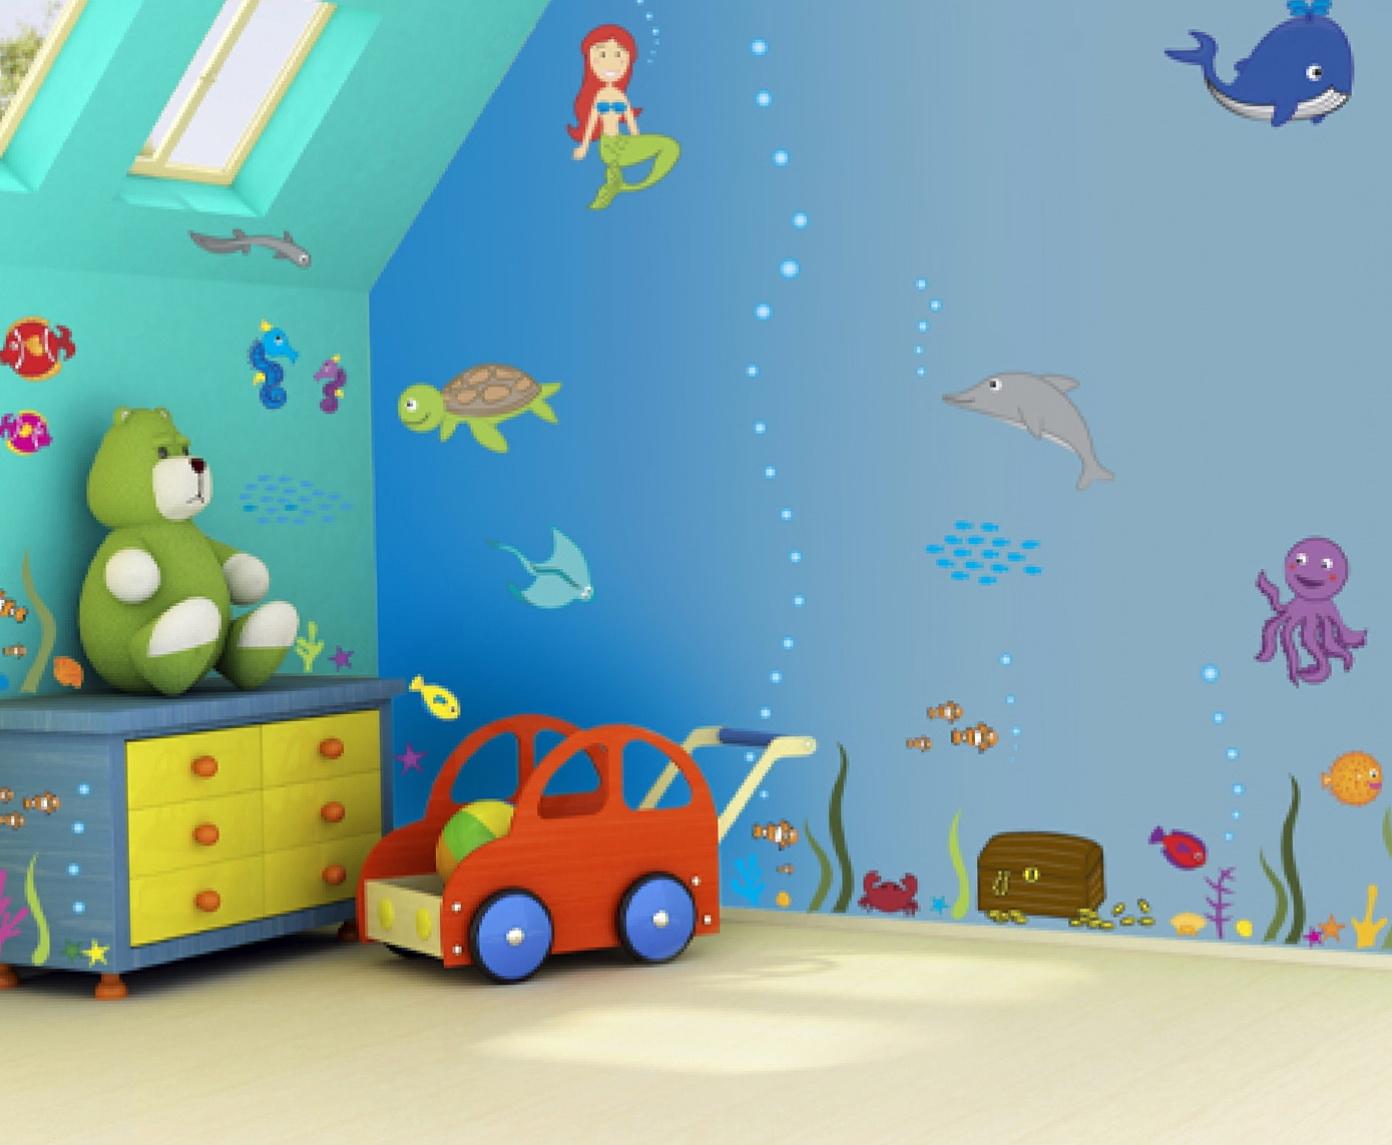 Wall Art For Kids Bedroom